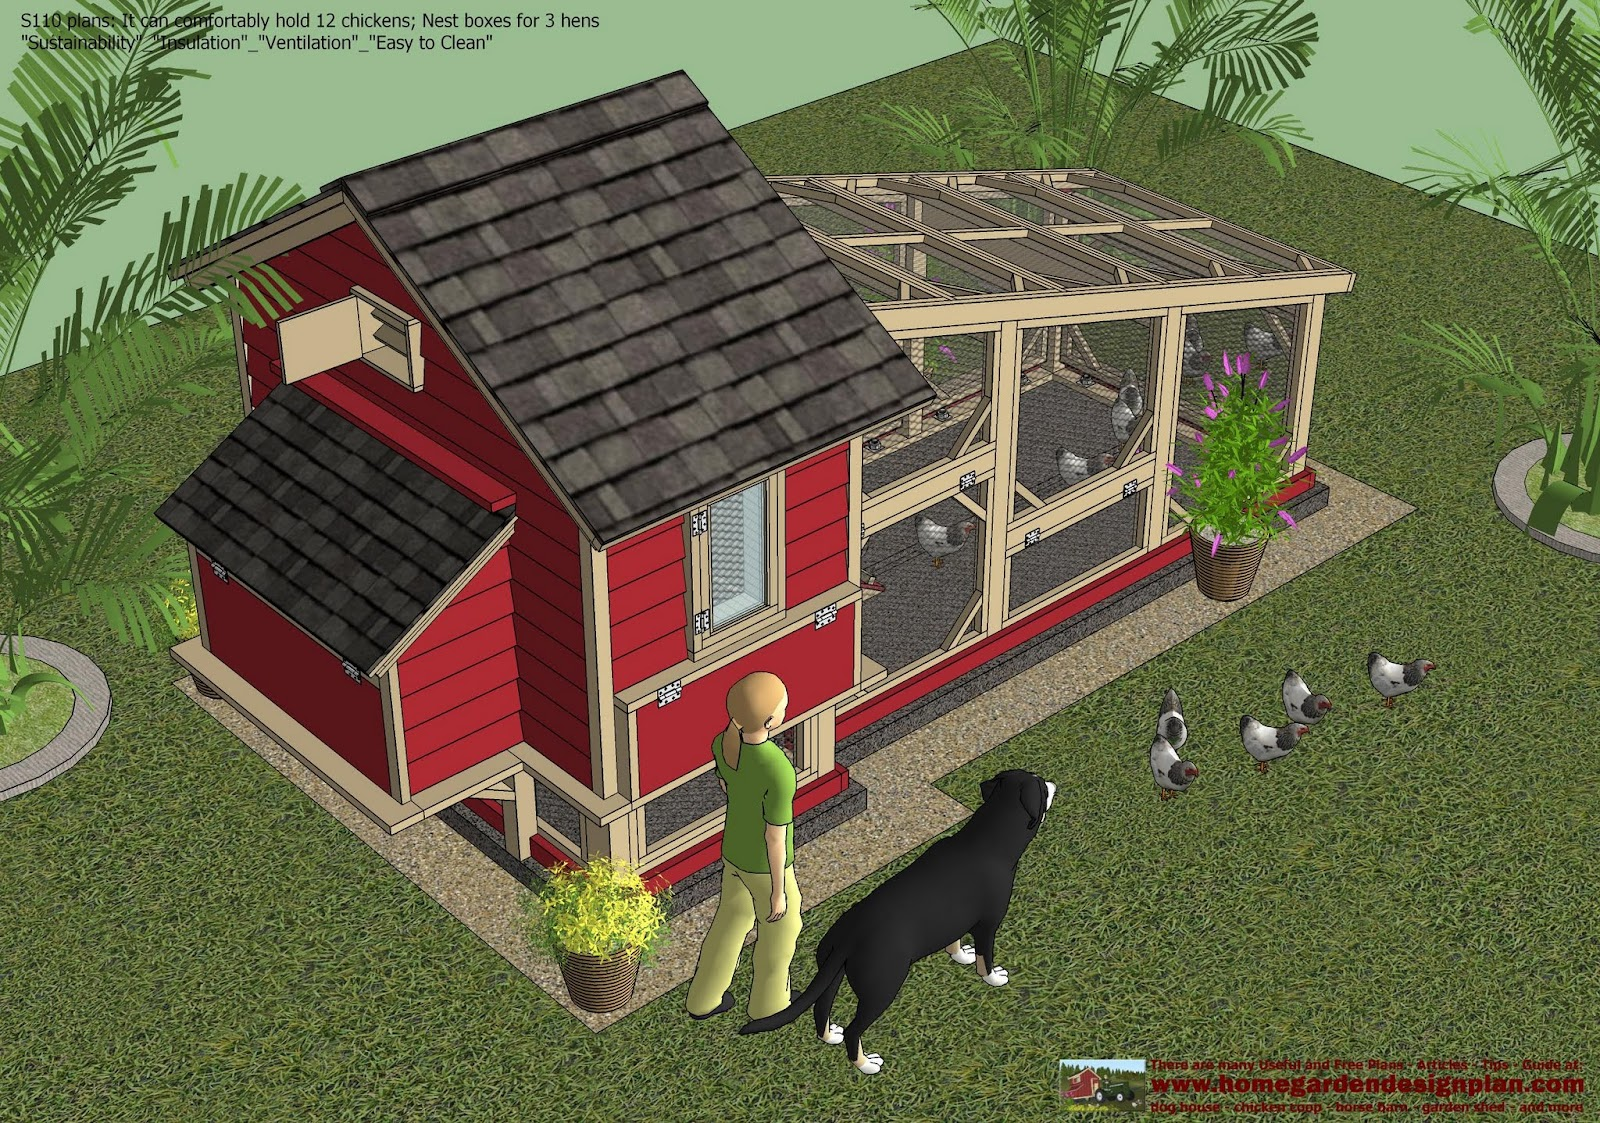 Home Garden Plans Chicken Coop Construction